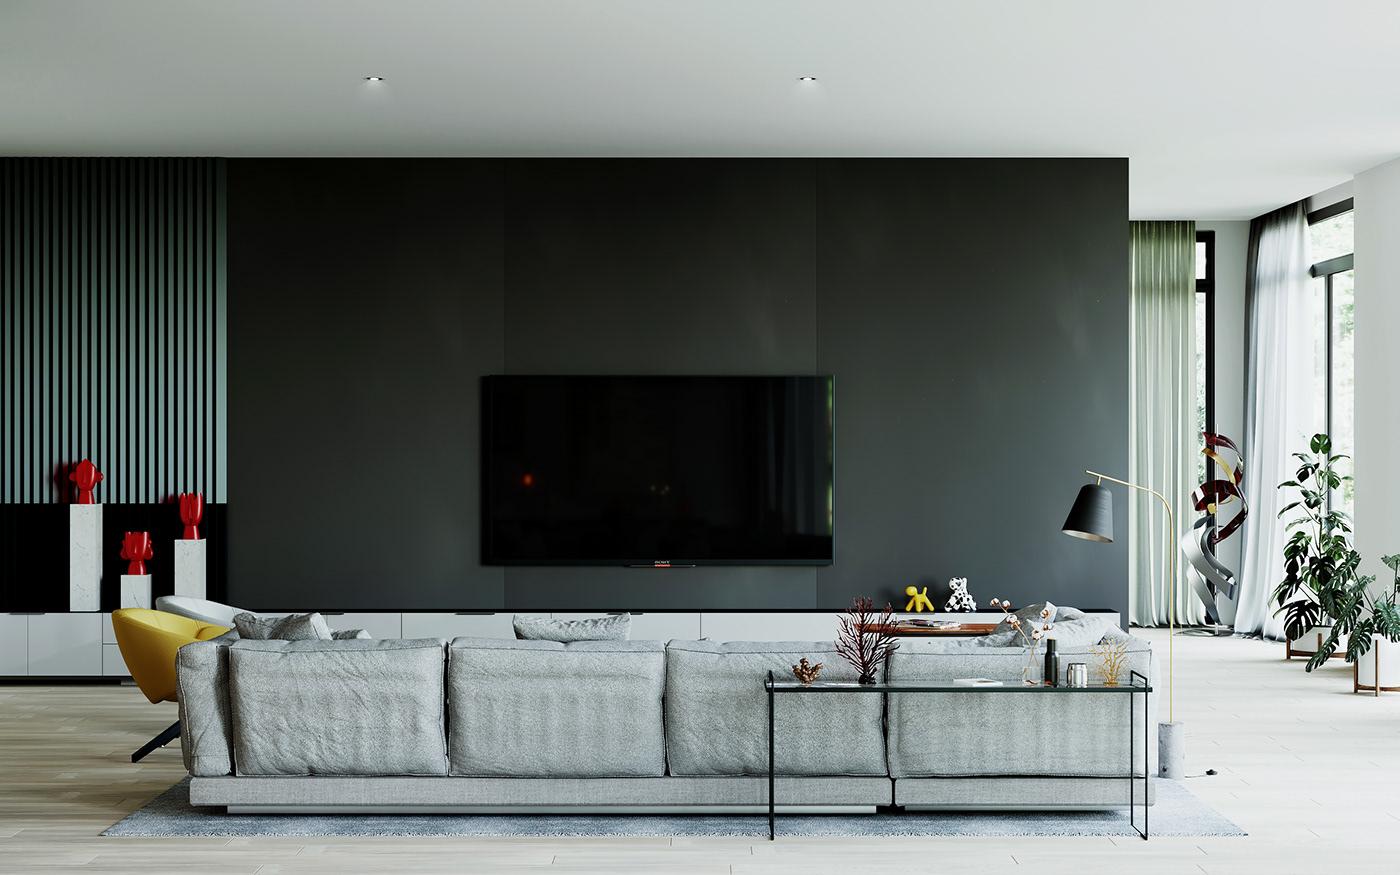 chair chimenea cinema 4d corona render  Lamp lampara Render salon silla living room